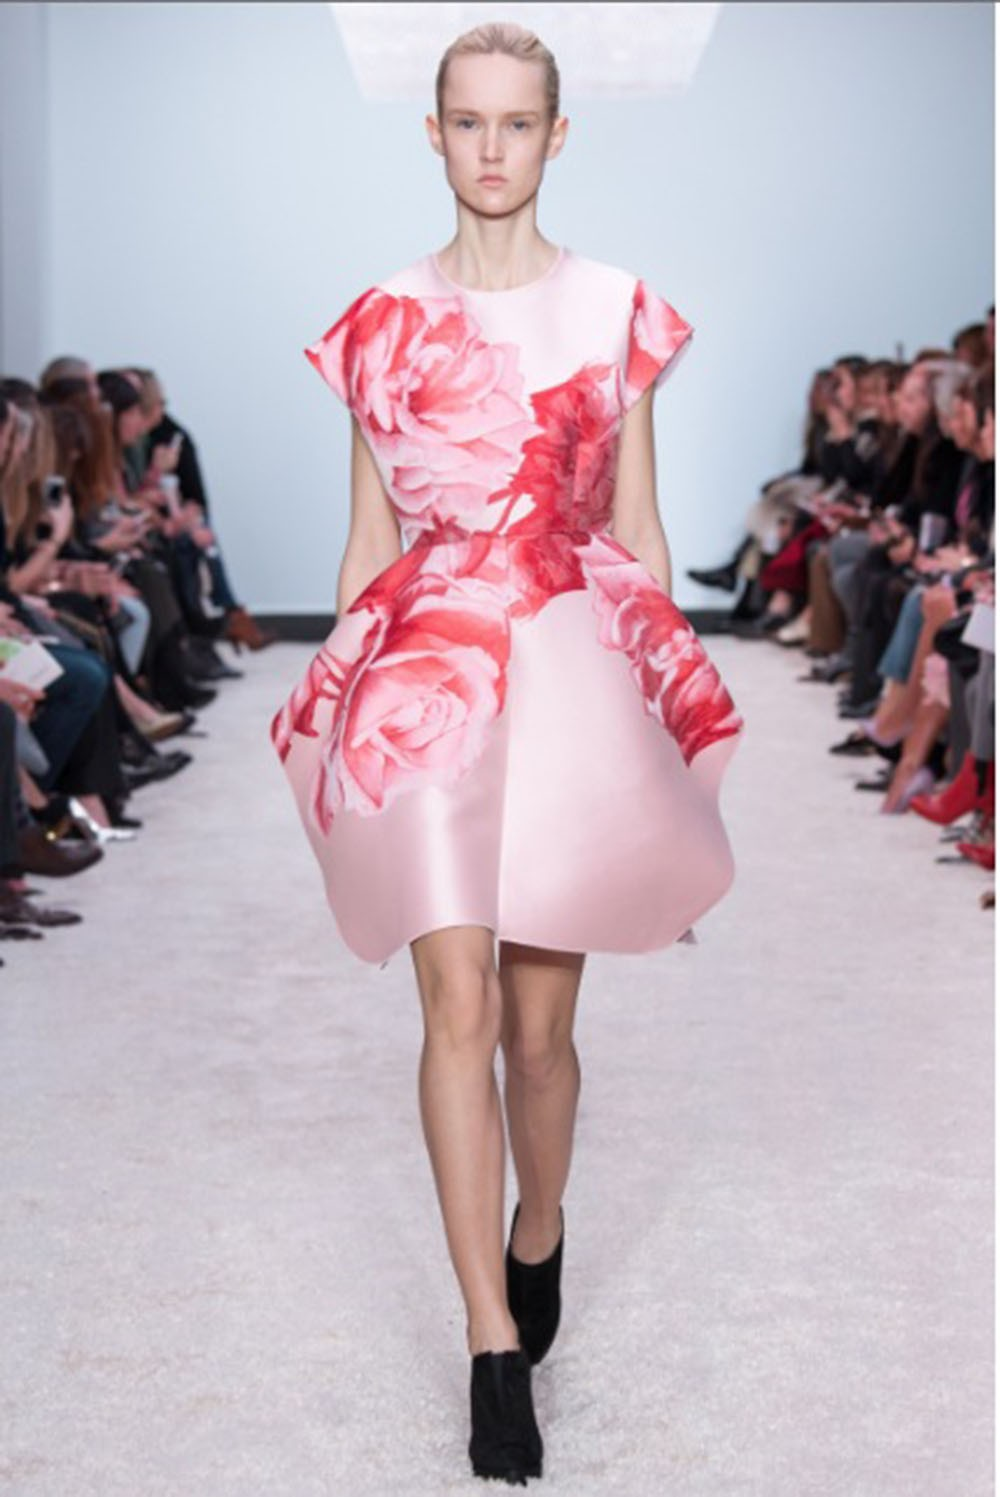 Rent a giambattista valli dress floral duchesse mini dress for Giambattista valli wedding dress price